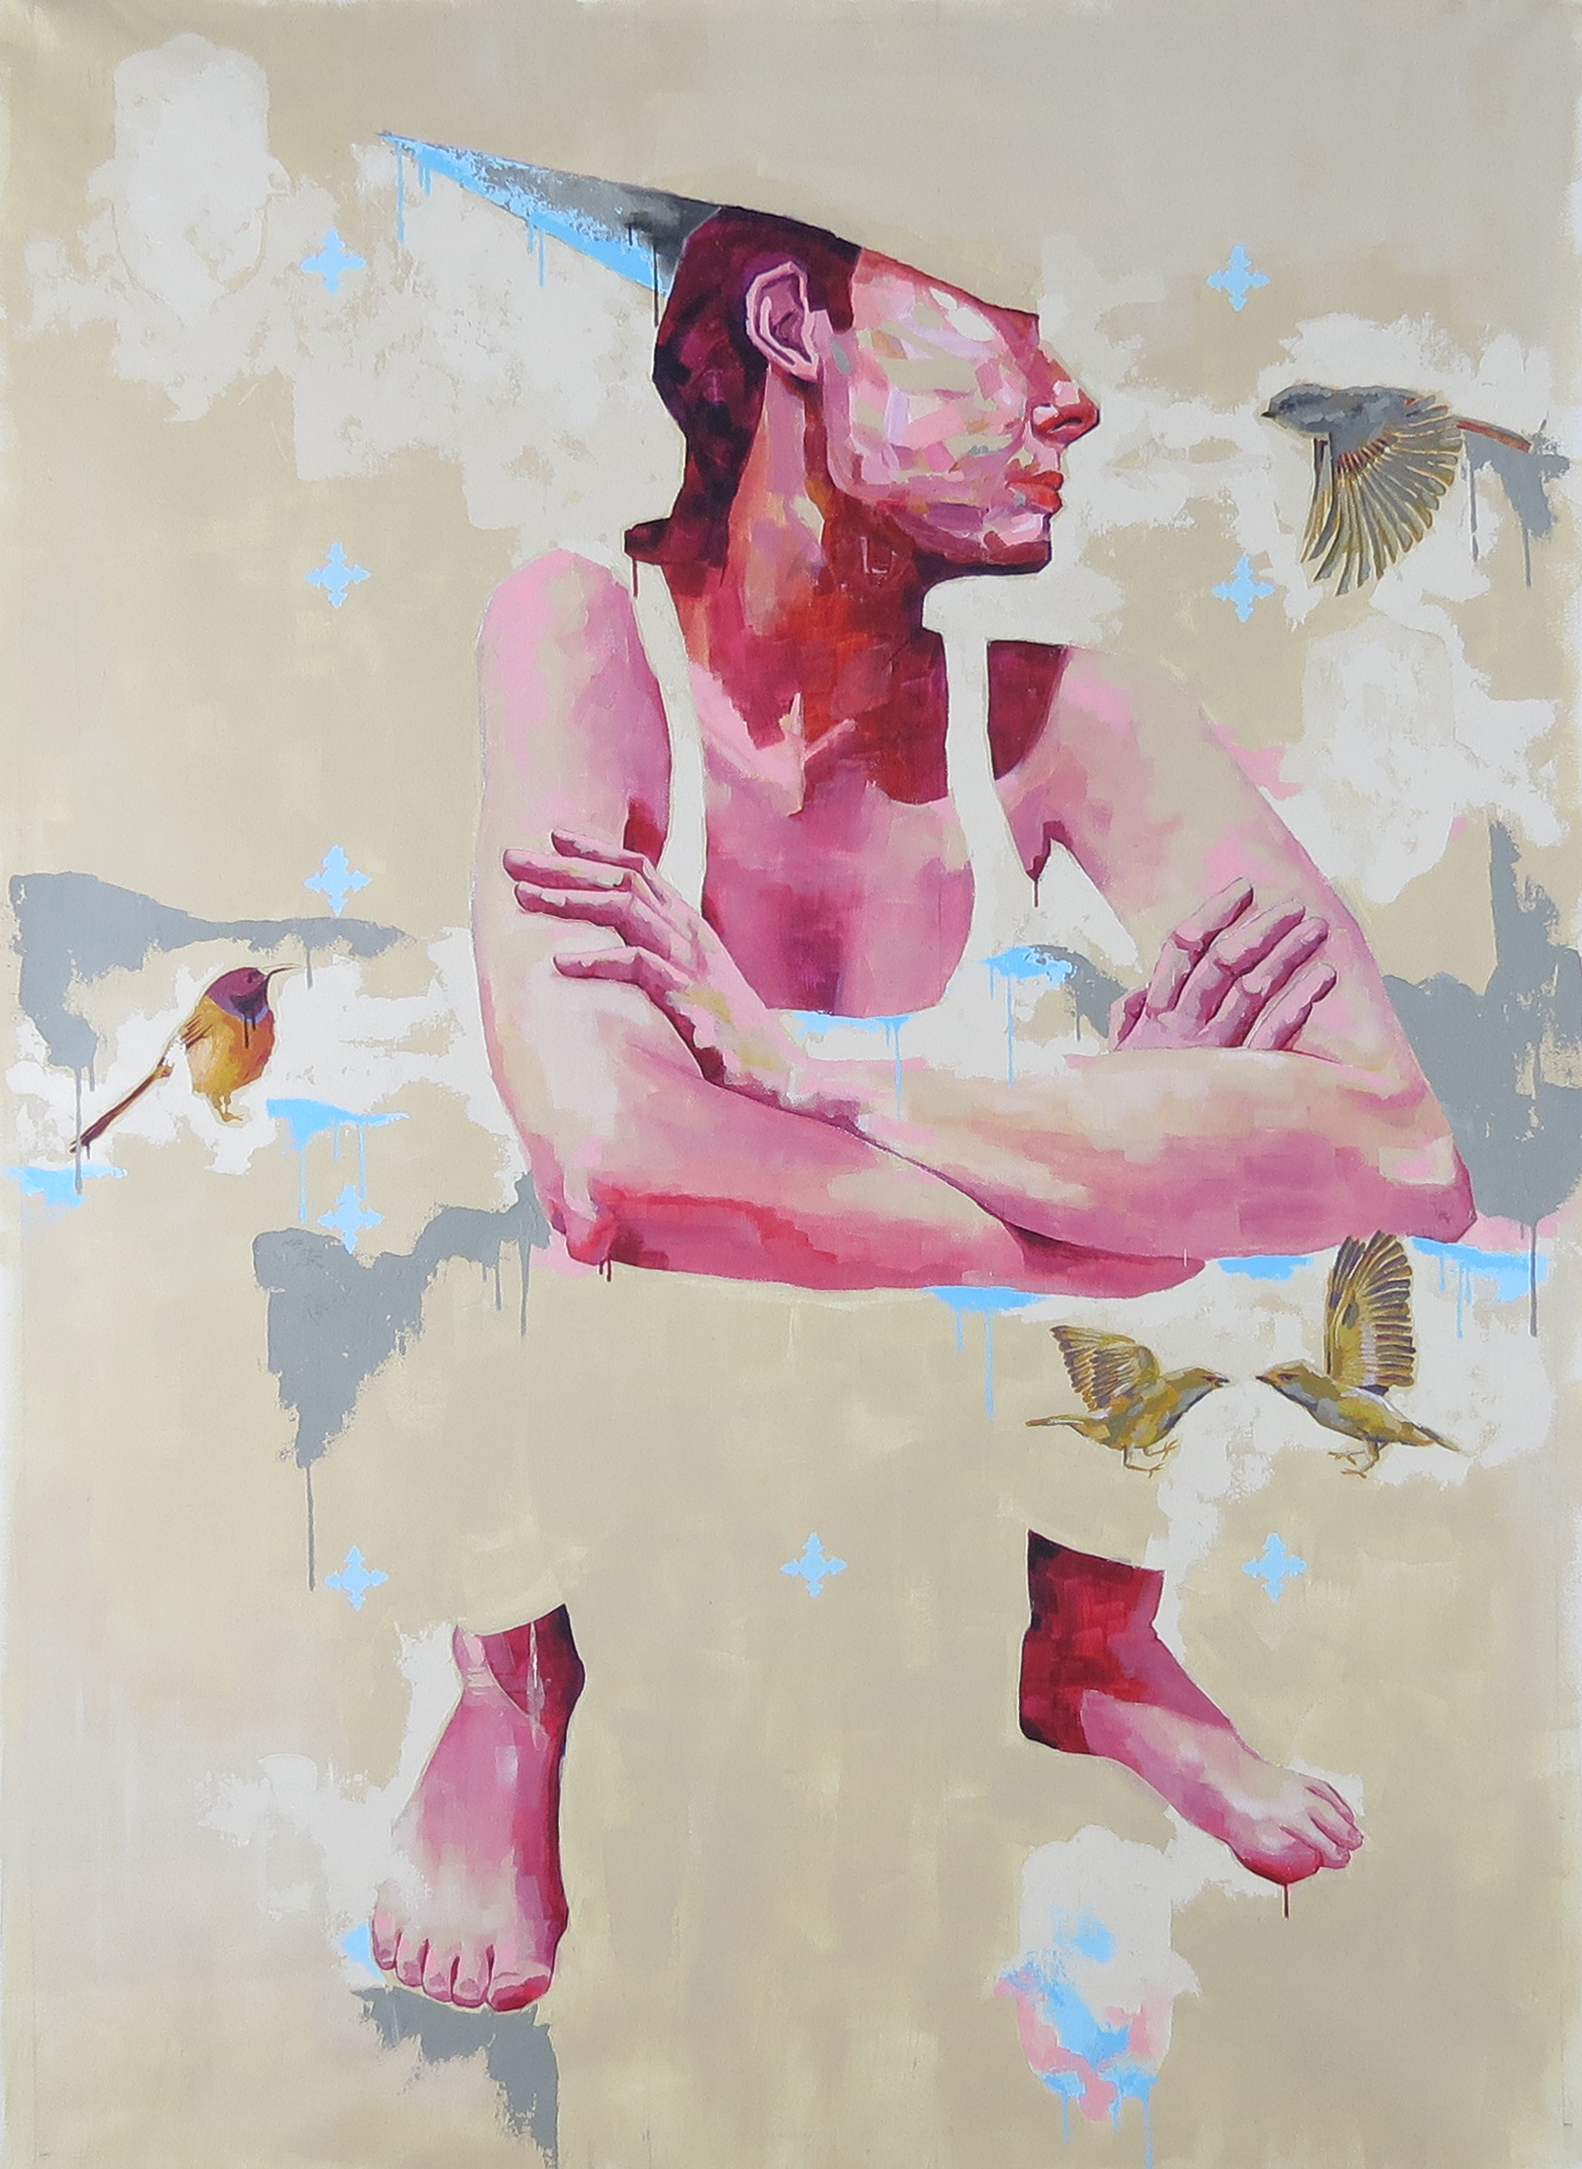 Yassine Mourit - The Villusion Painting FarAway.jpg